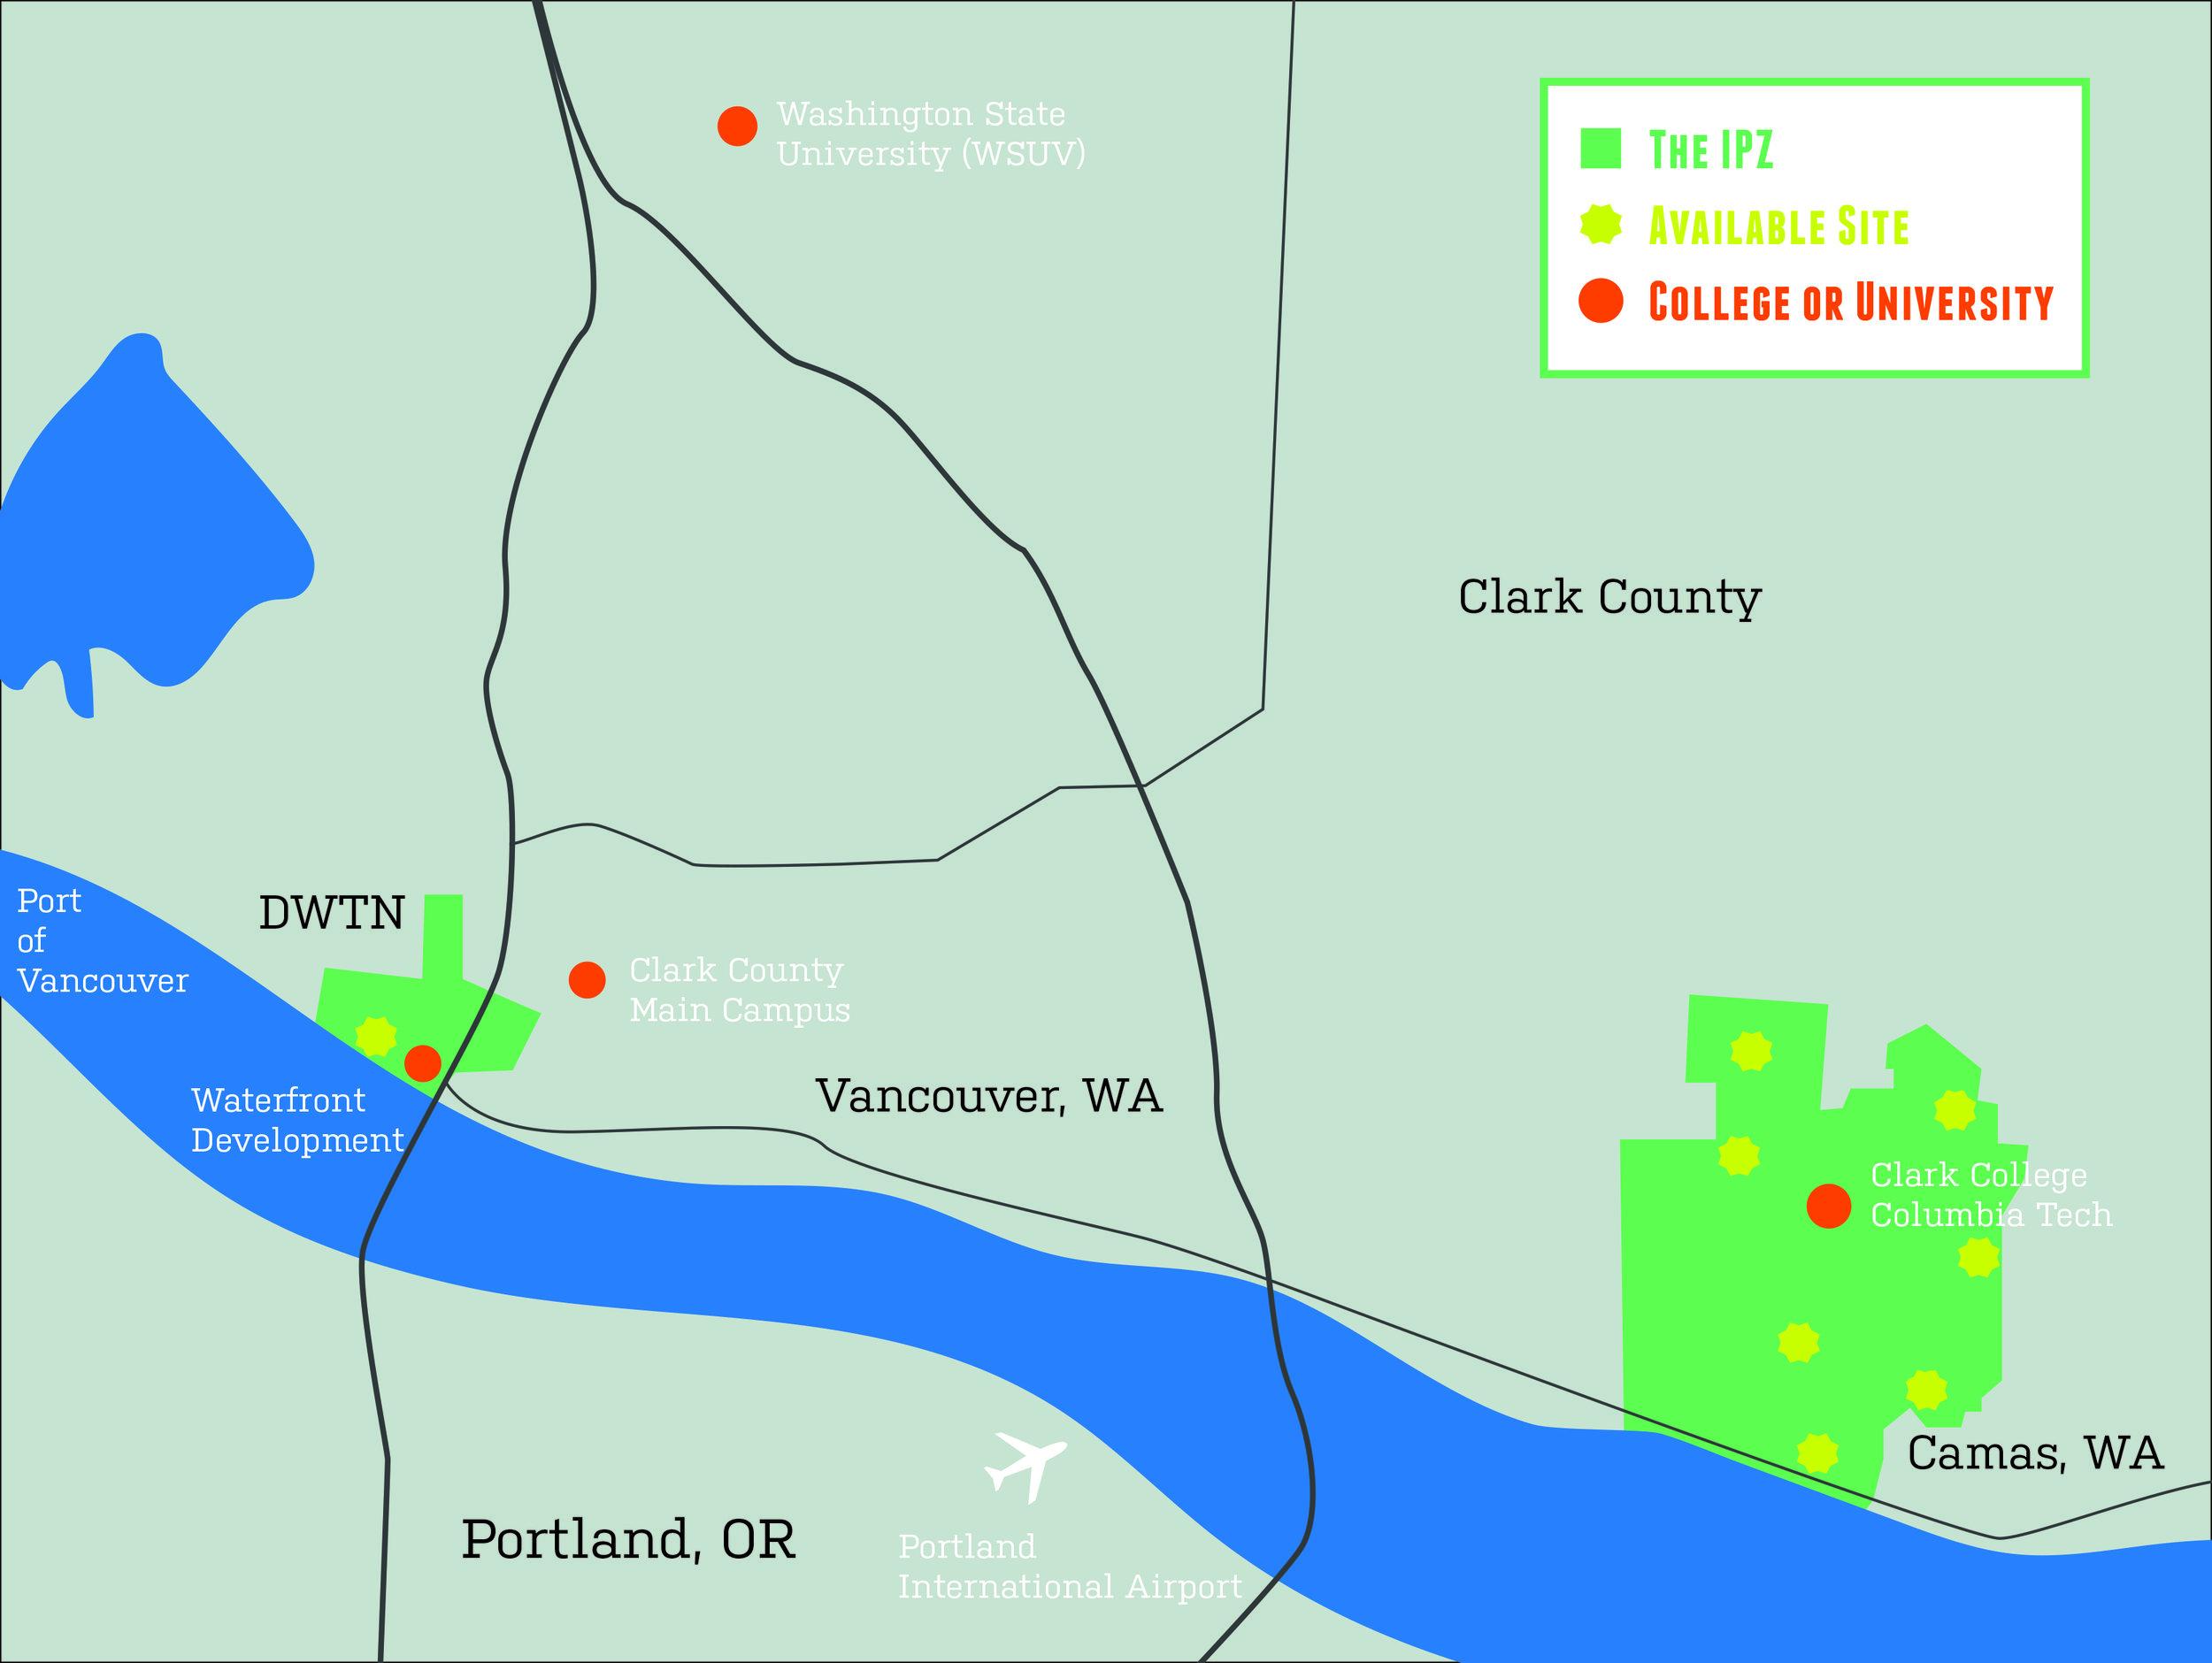 ipz_map.jpg